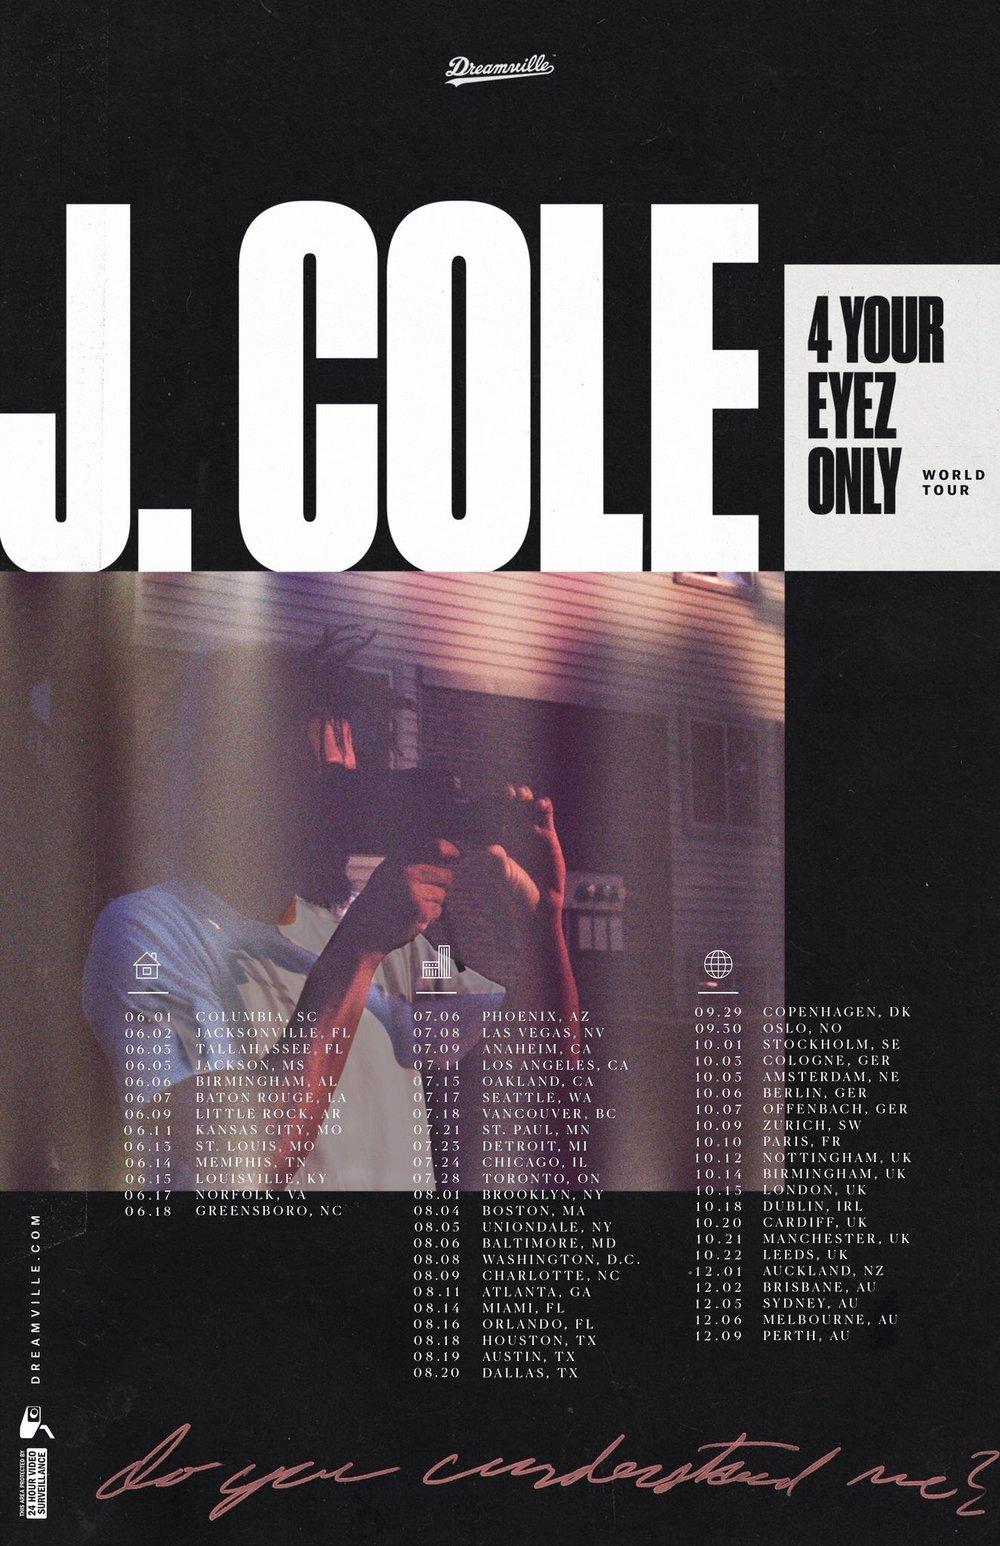 cole-tour.jpg